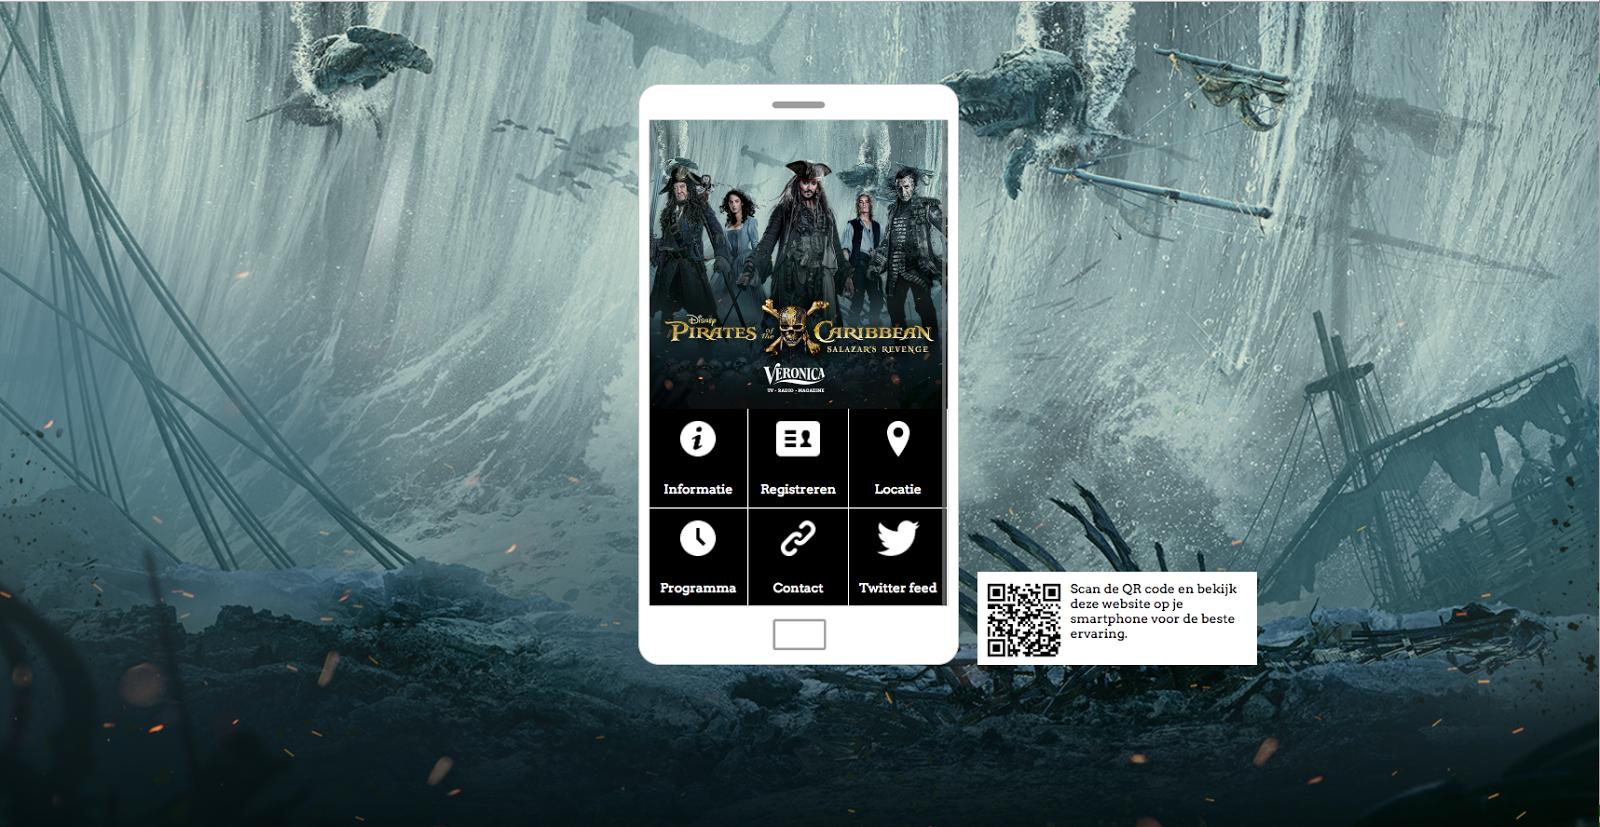 The event website design for SBS